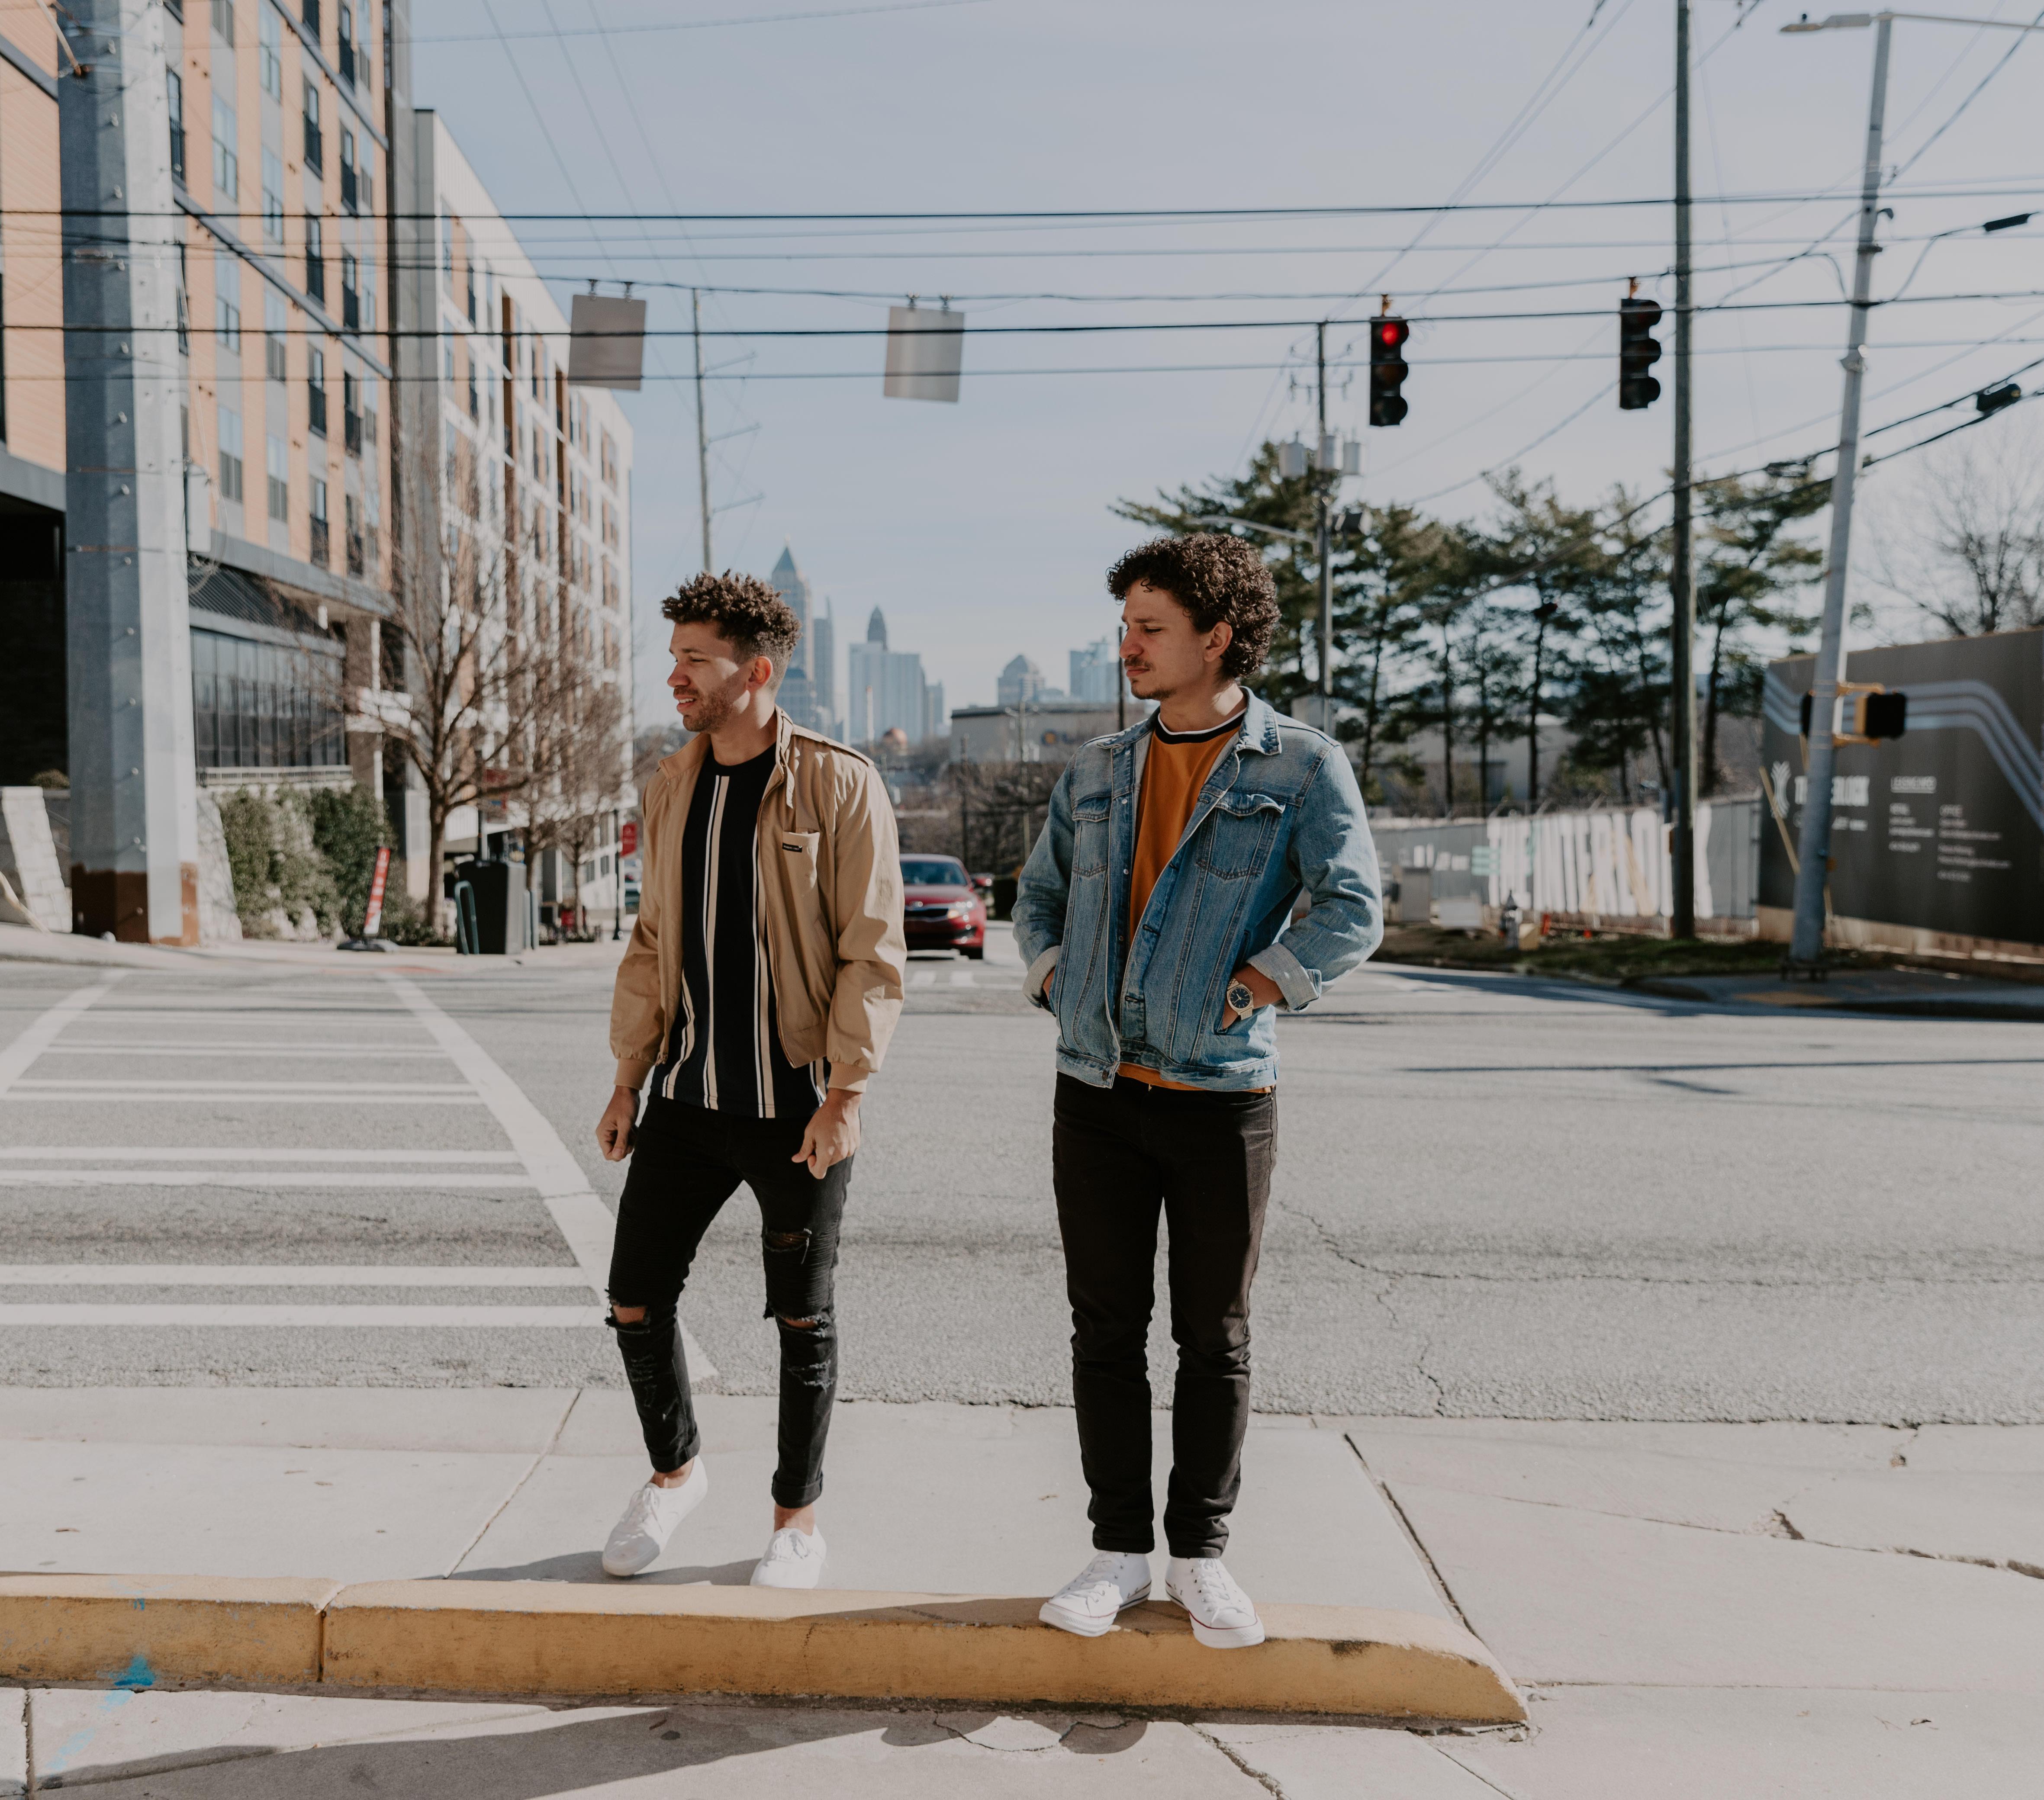 Atlanta Exploring lifestyle rooftop urban photoshoot styled shoot golden hour city background